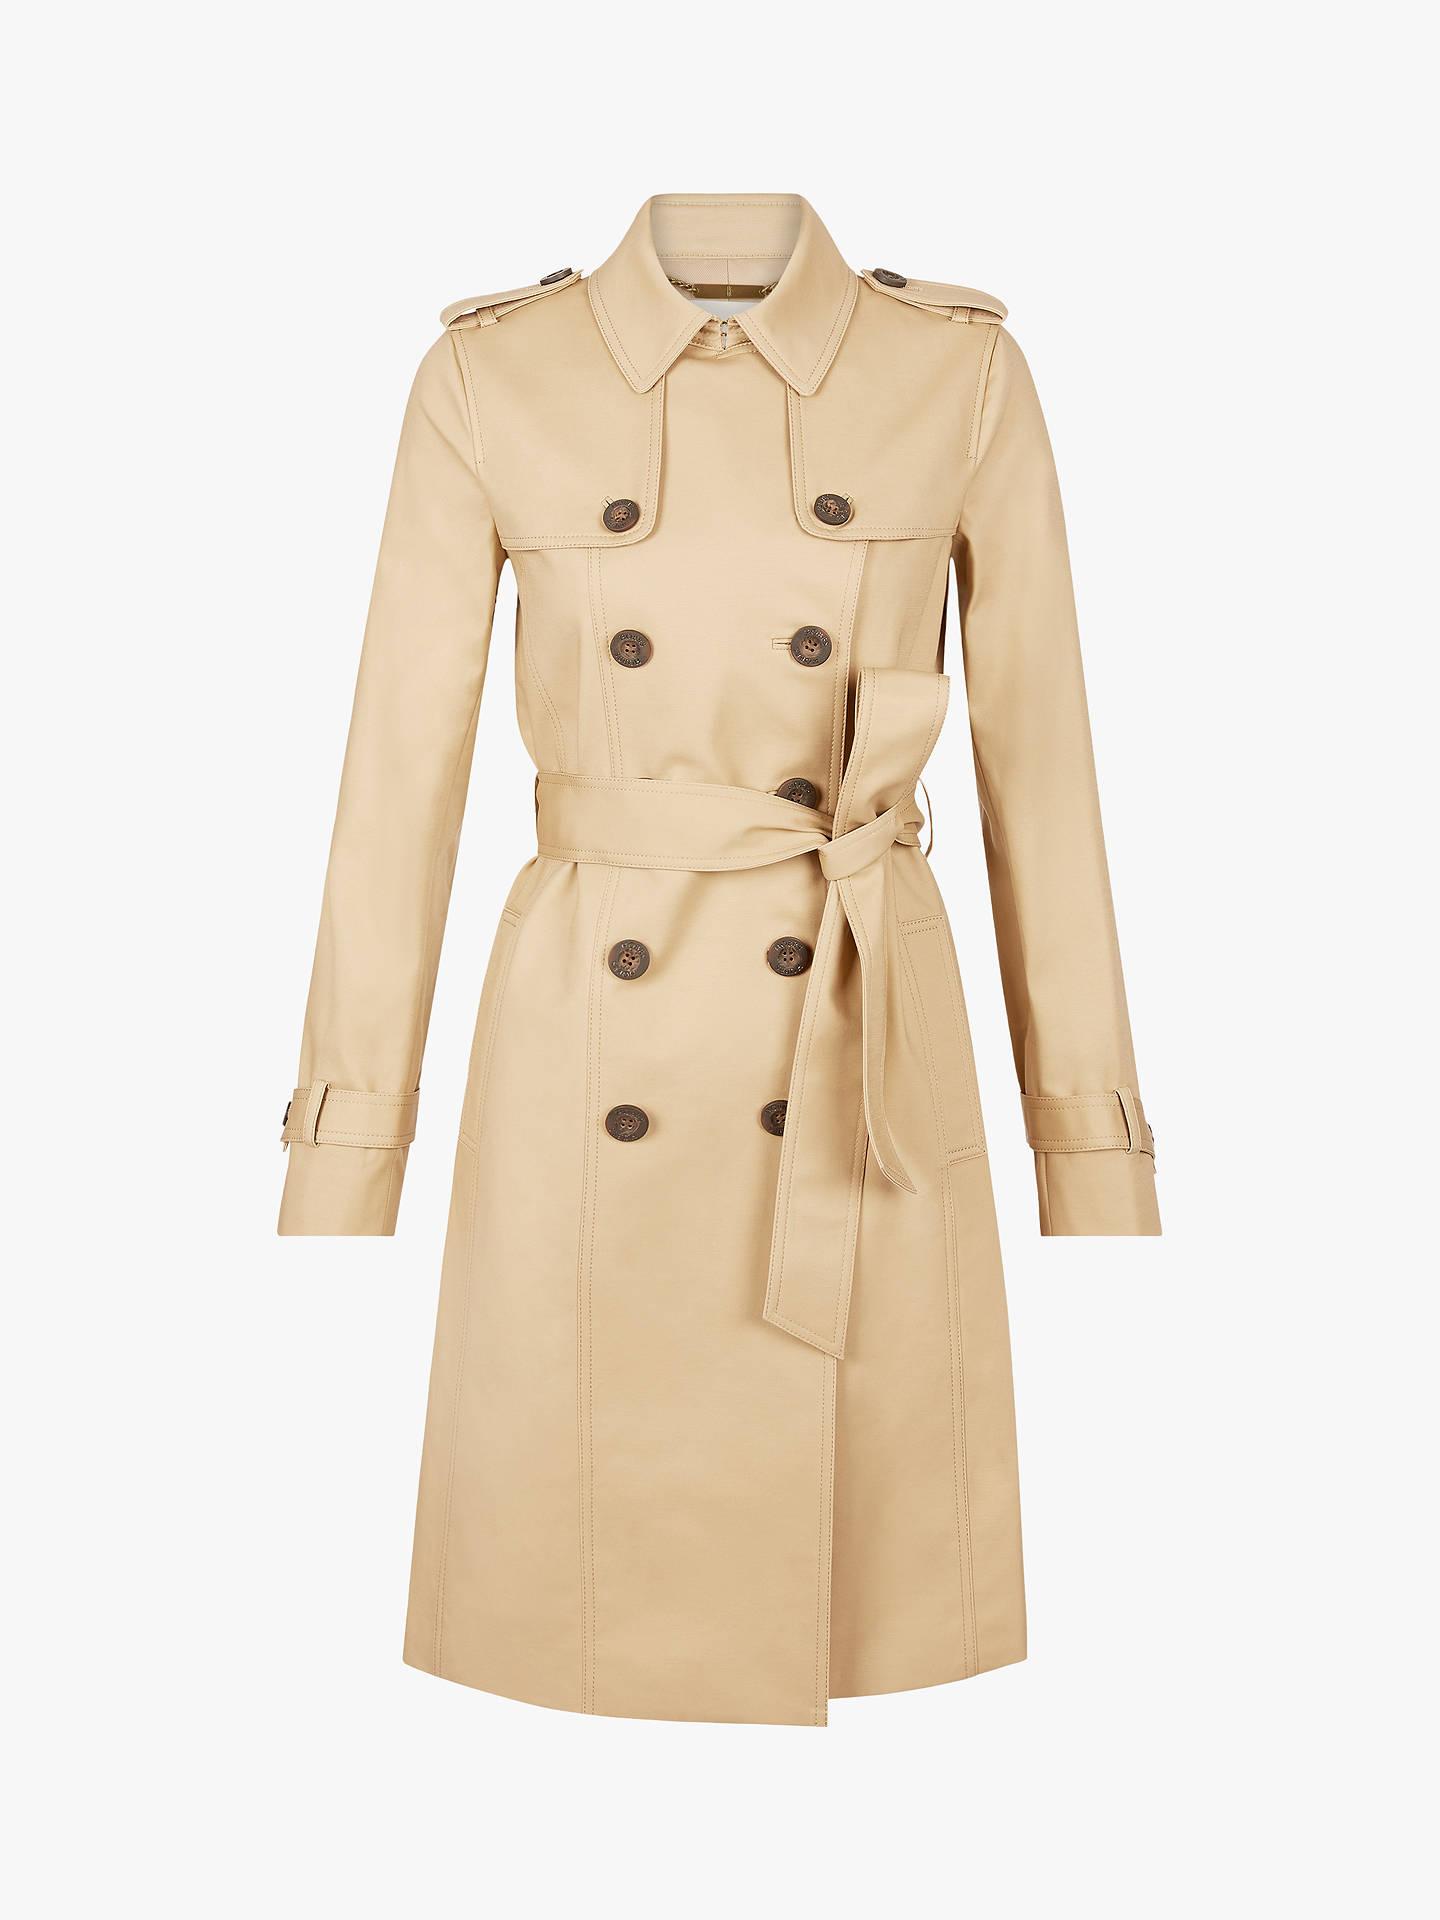 On Clearance newest reasonably priced Hobbs Petite London Saskia Trench Coat, Mocha